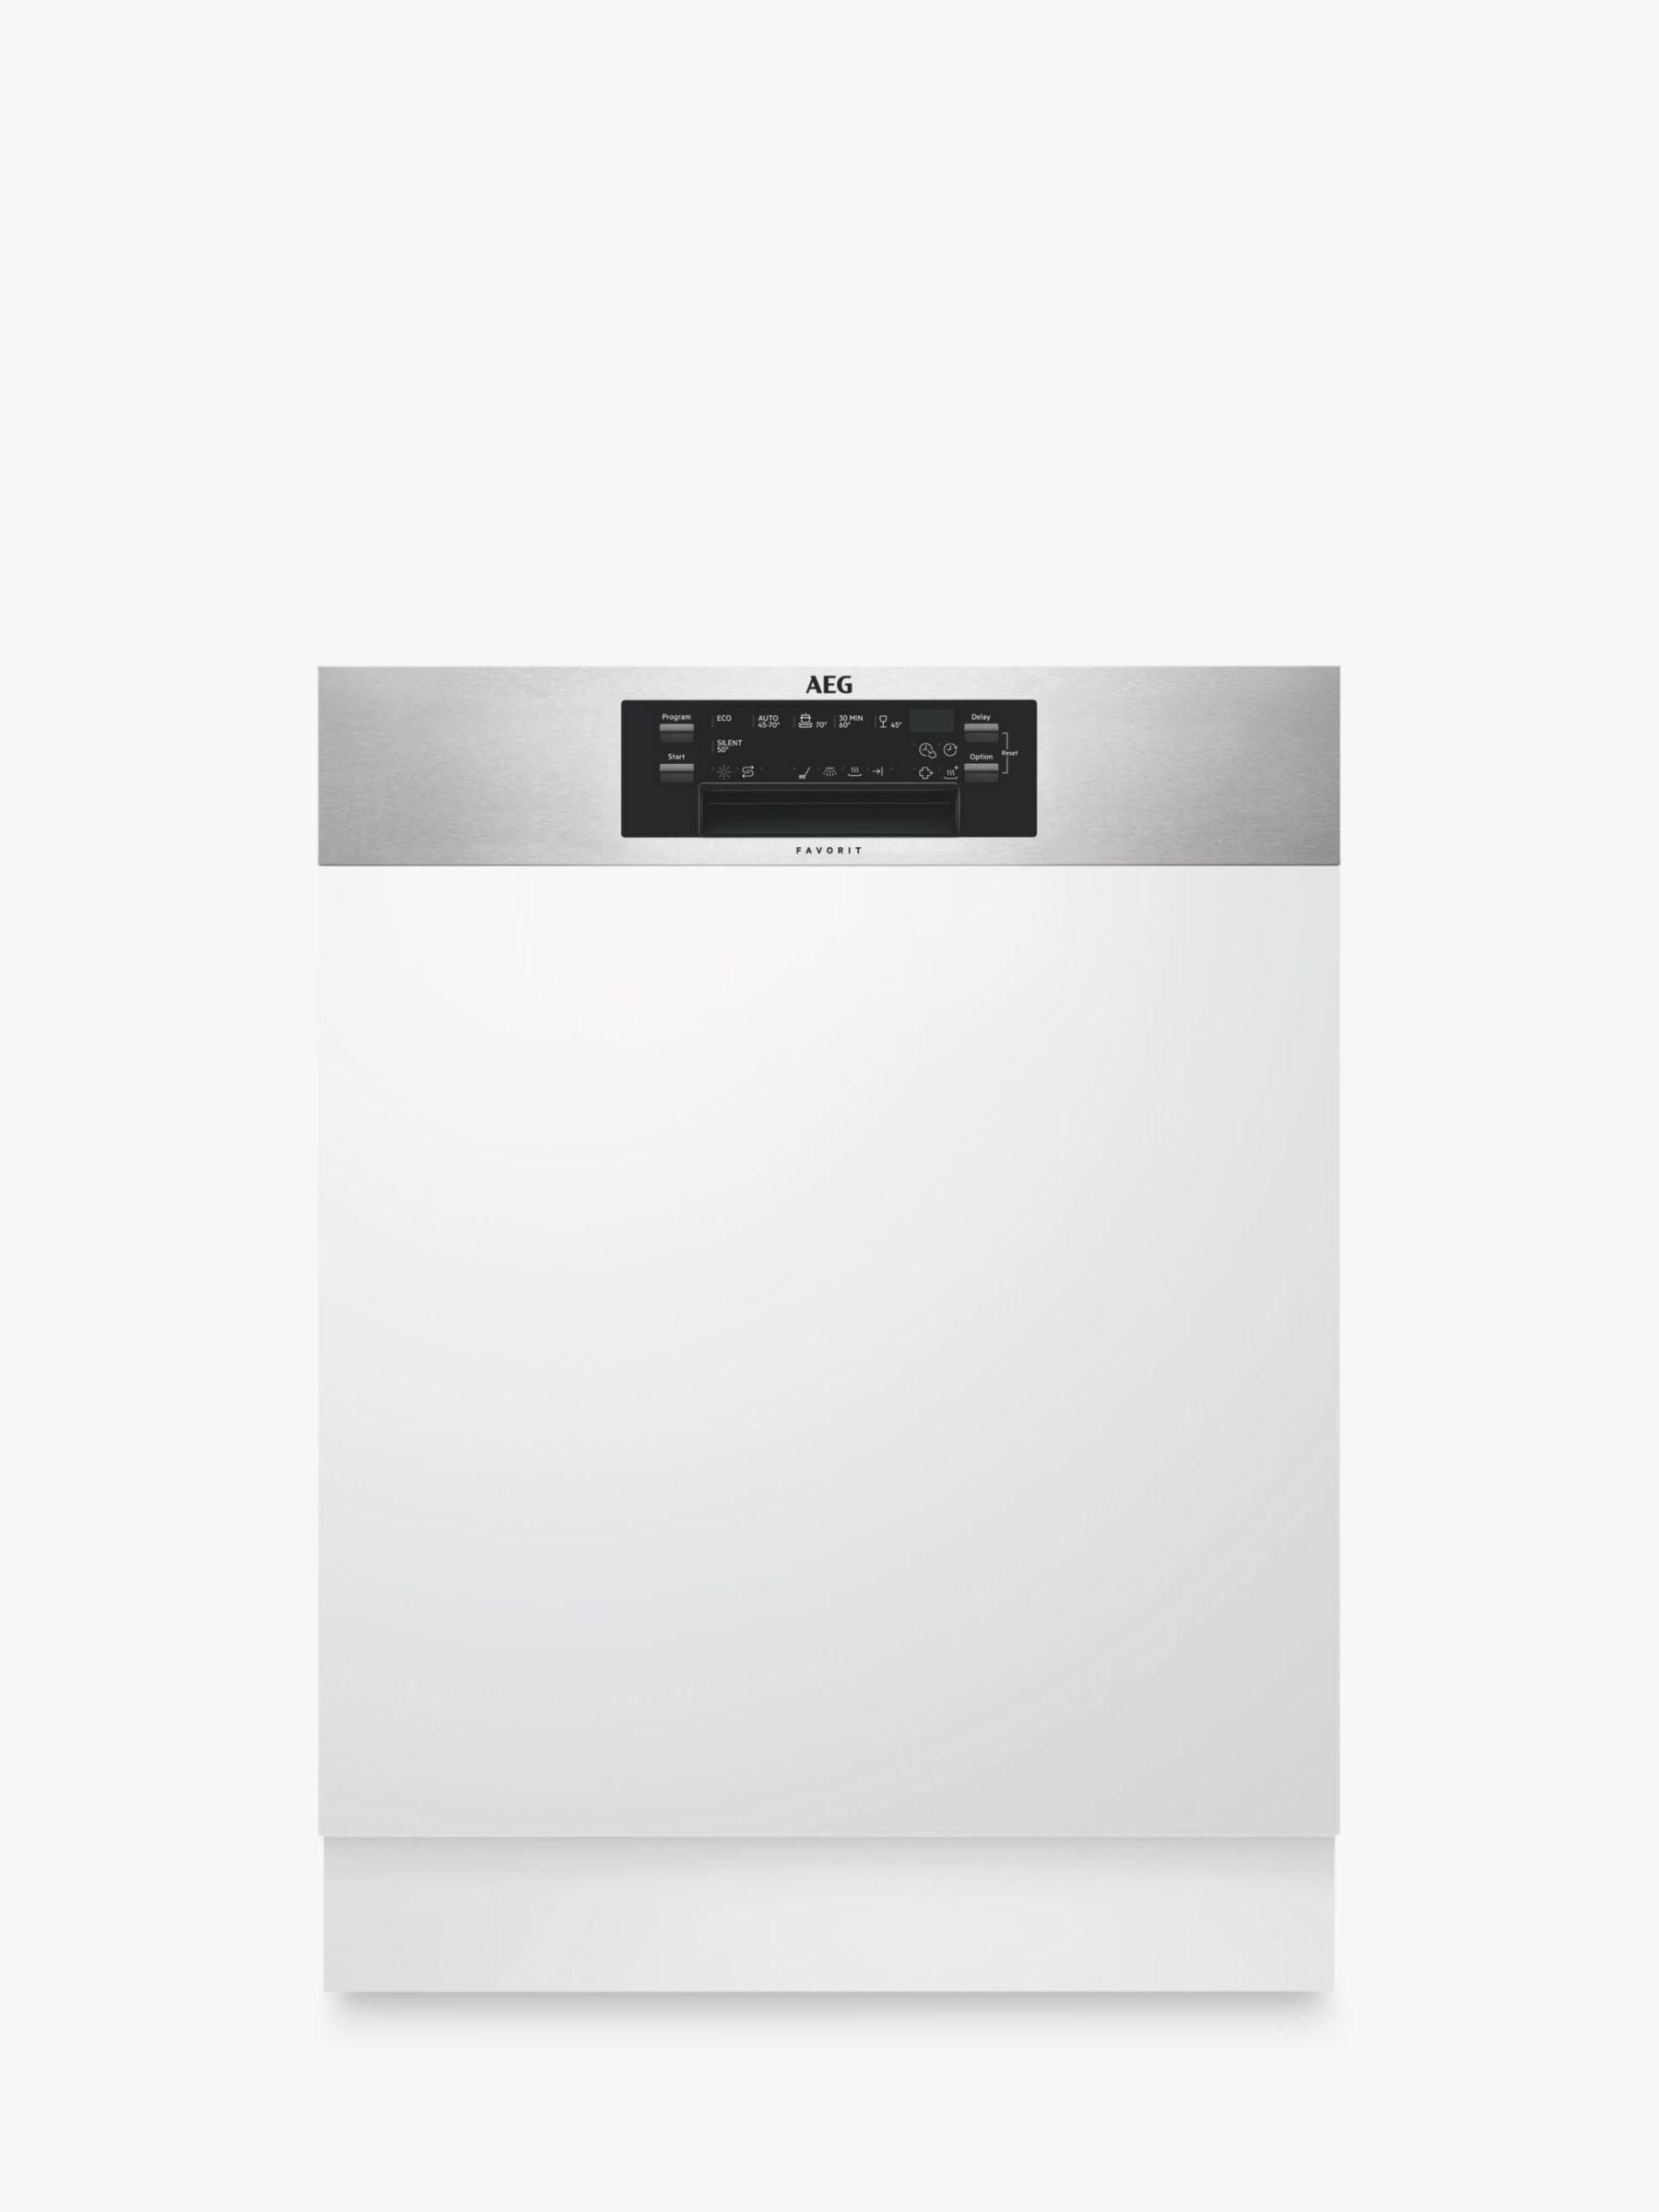 Aeg Fee62600pm Semi Integrated Dishwasher Stainless Steel At John